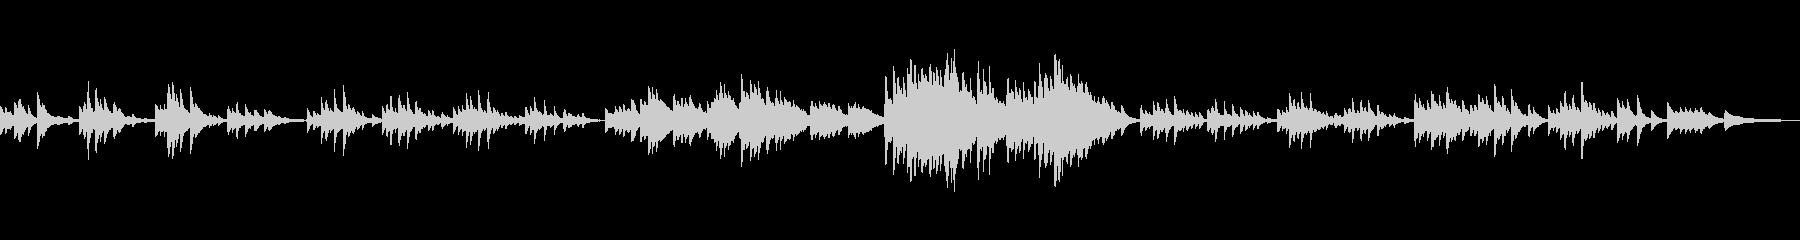 C=528Hz 癒しのソロ・ピアノの未再生の波形